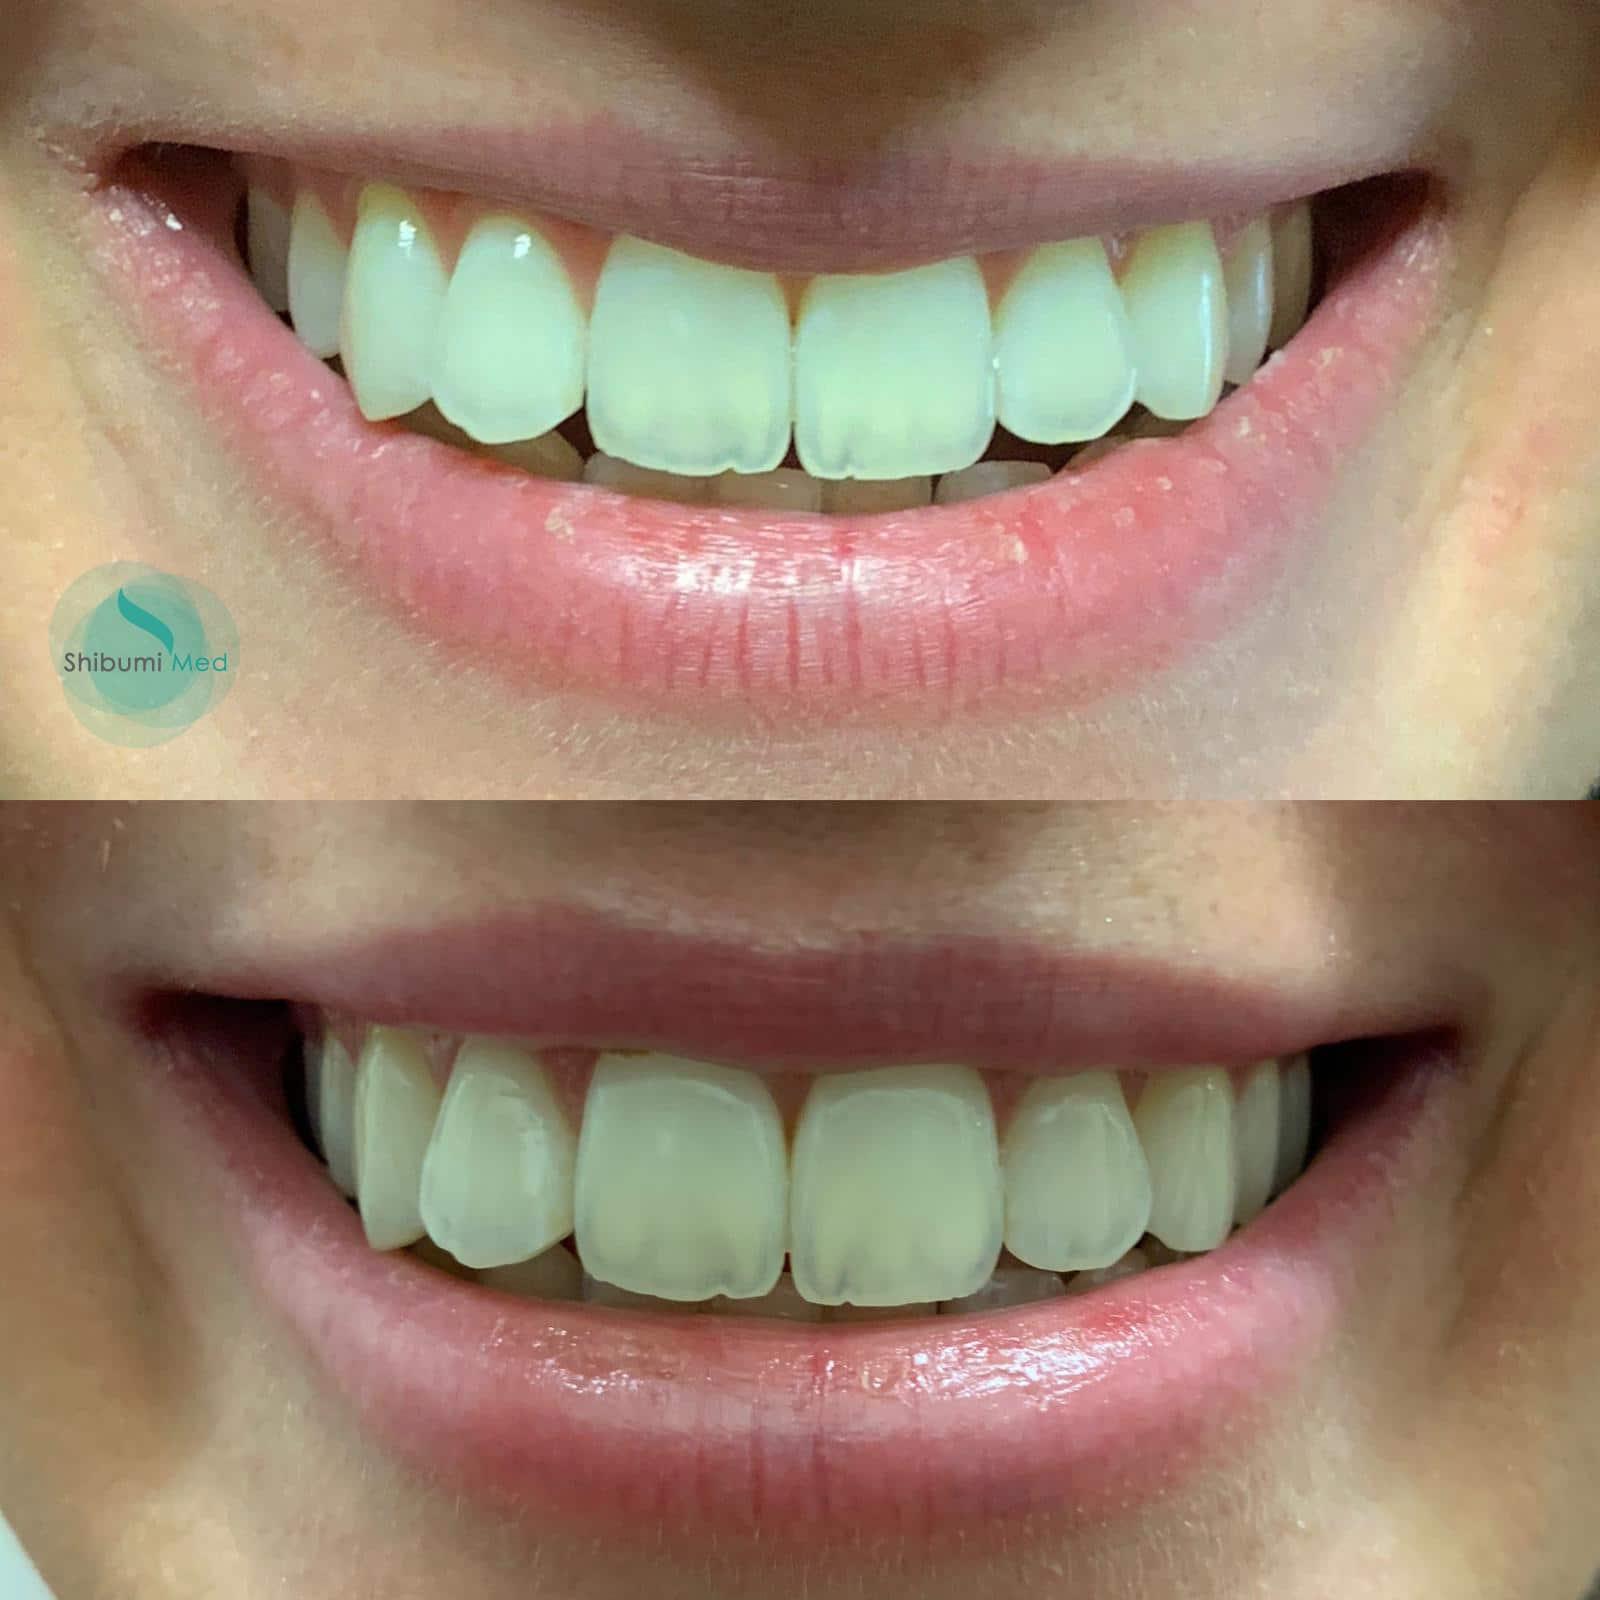 Filler Labbra sorriso - Shibumi Med Torino